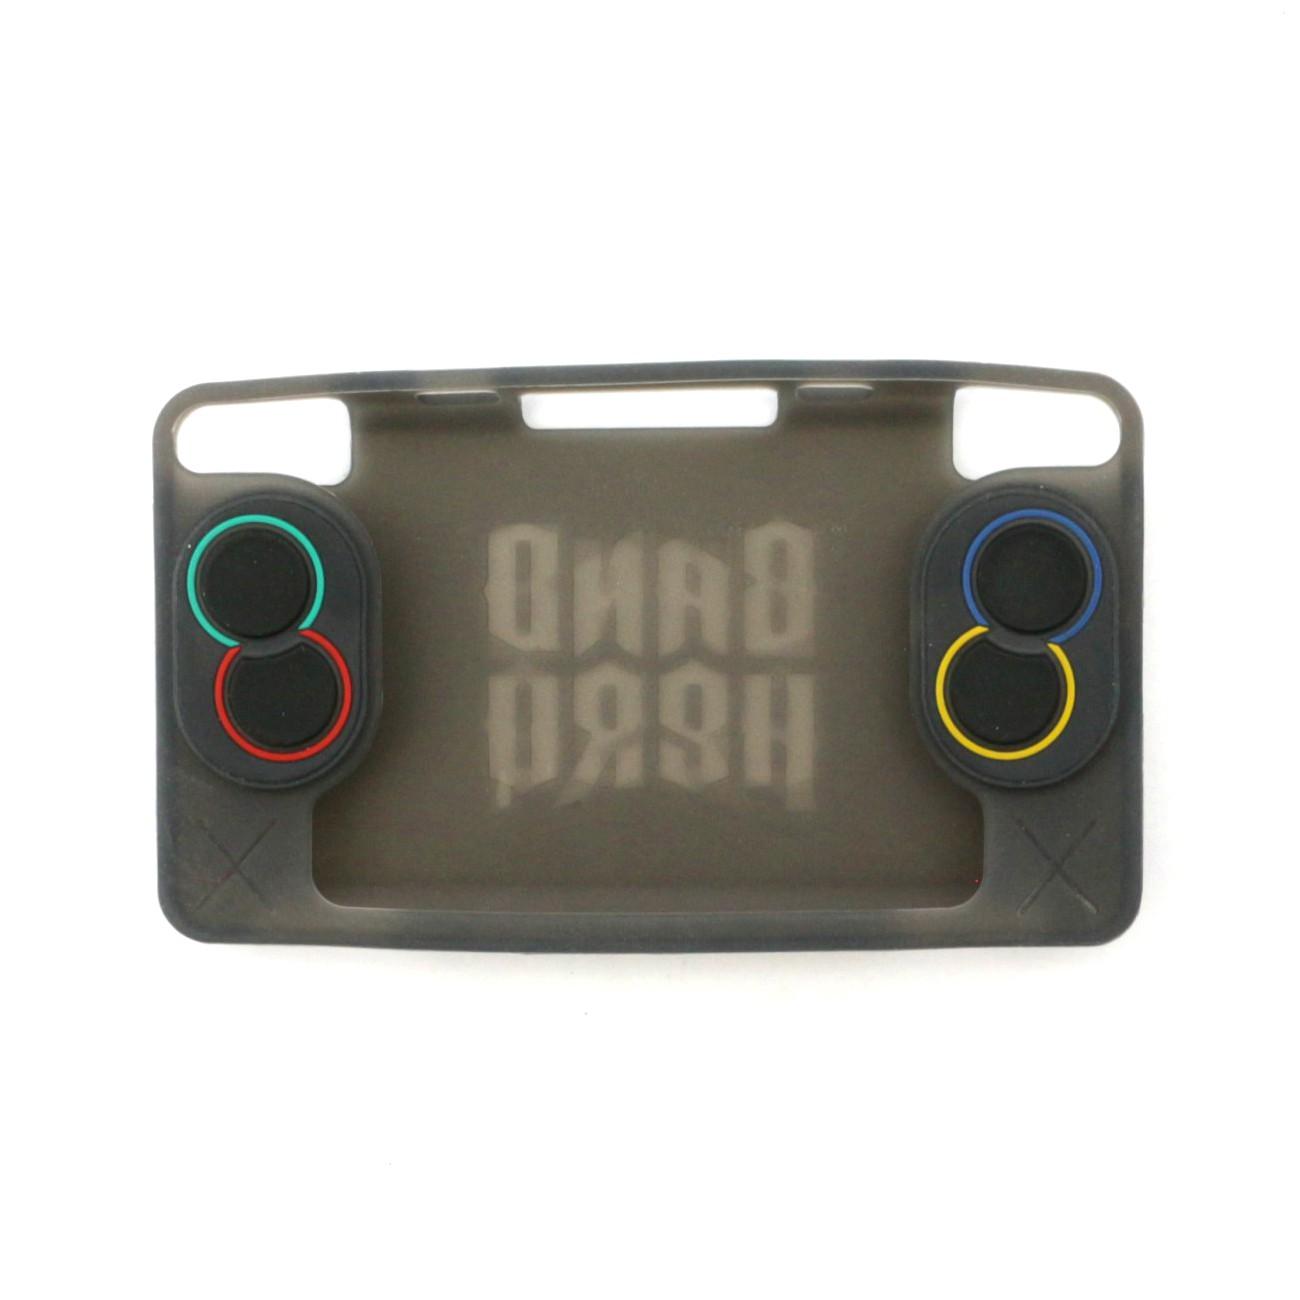 Band Hero Drum Grip Controller